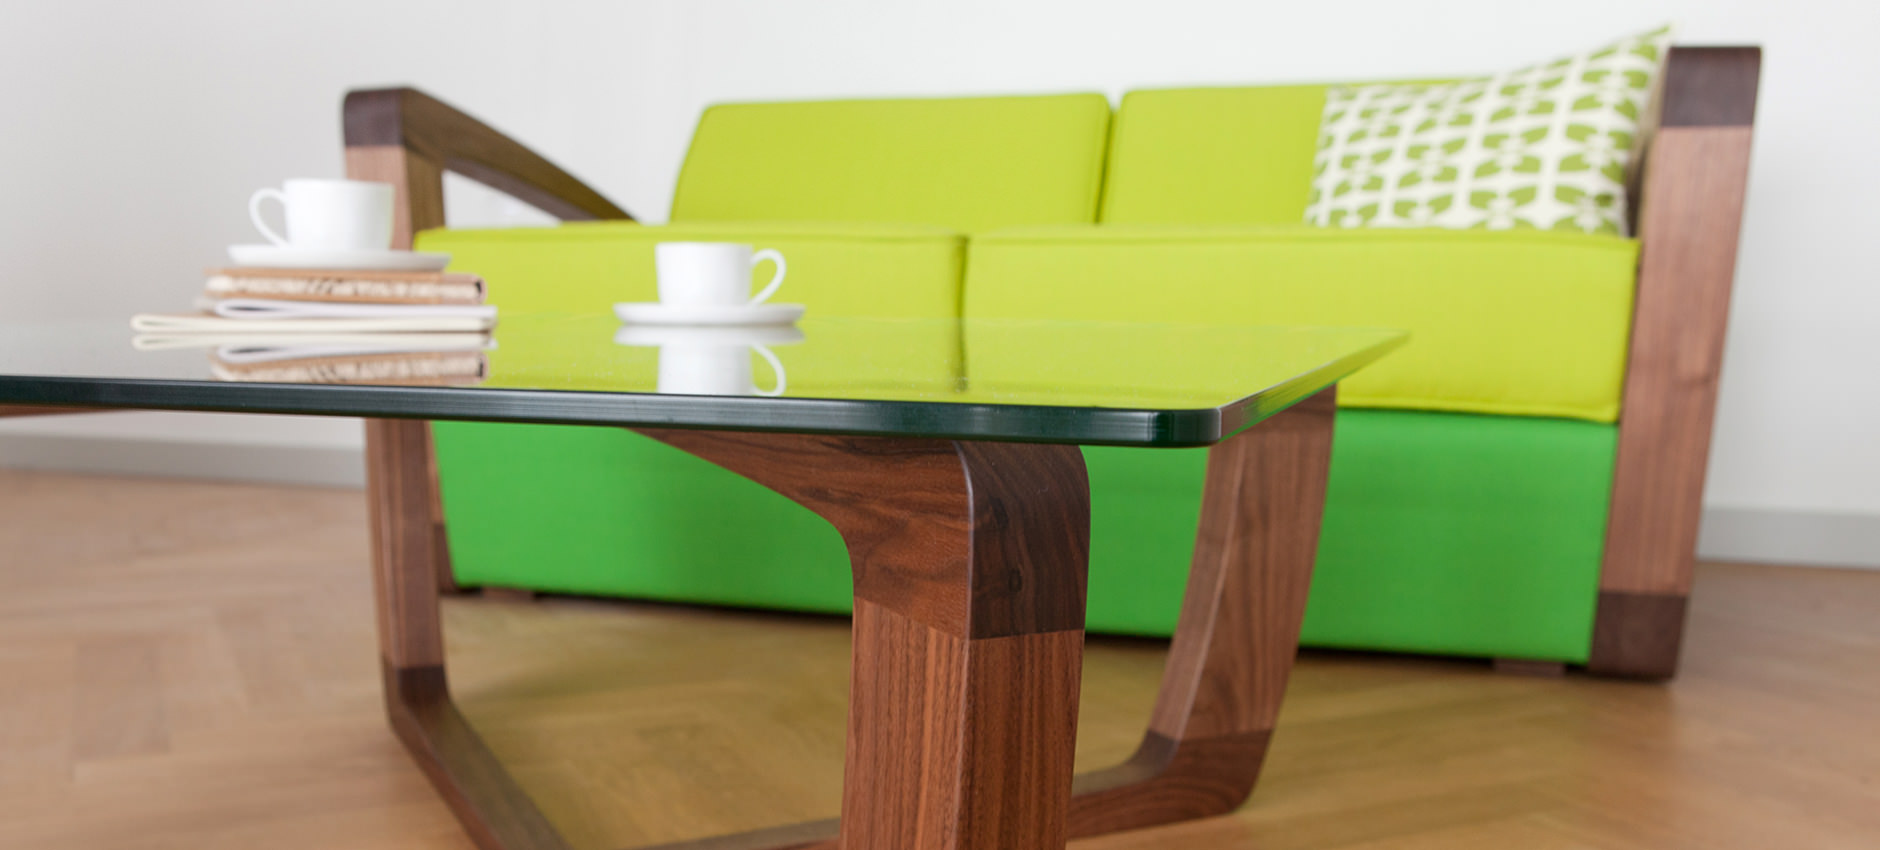 Tips to Find Replica Furniture in Melbourne